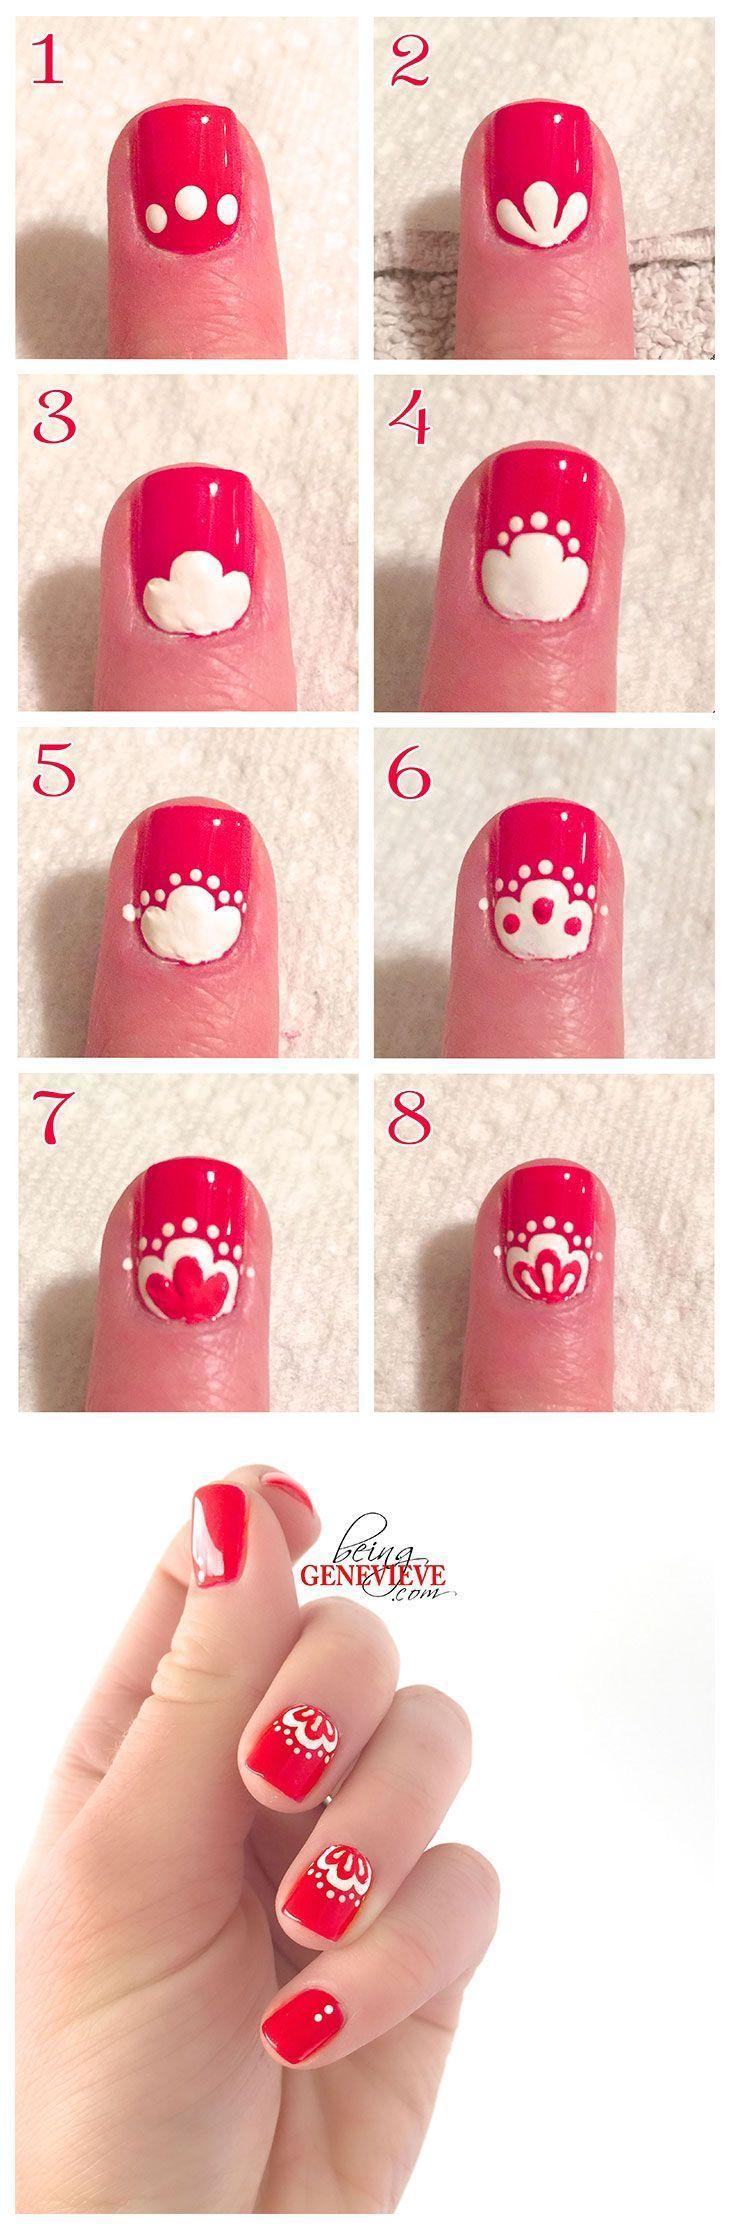 Oriental lace nail art design.